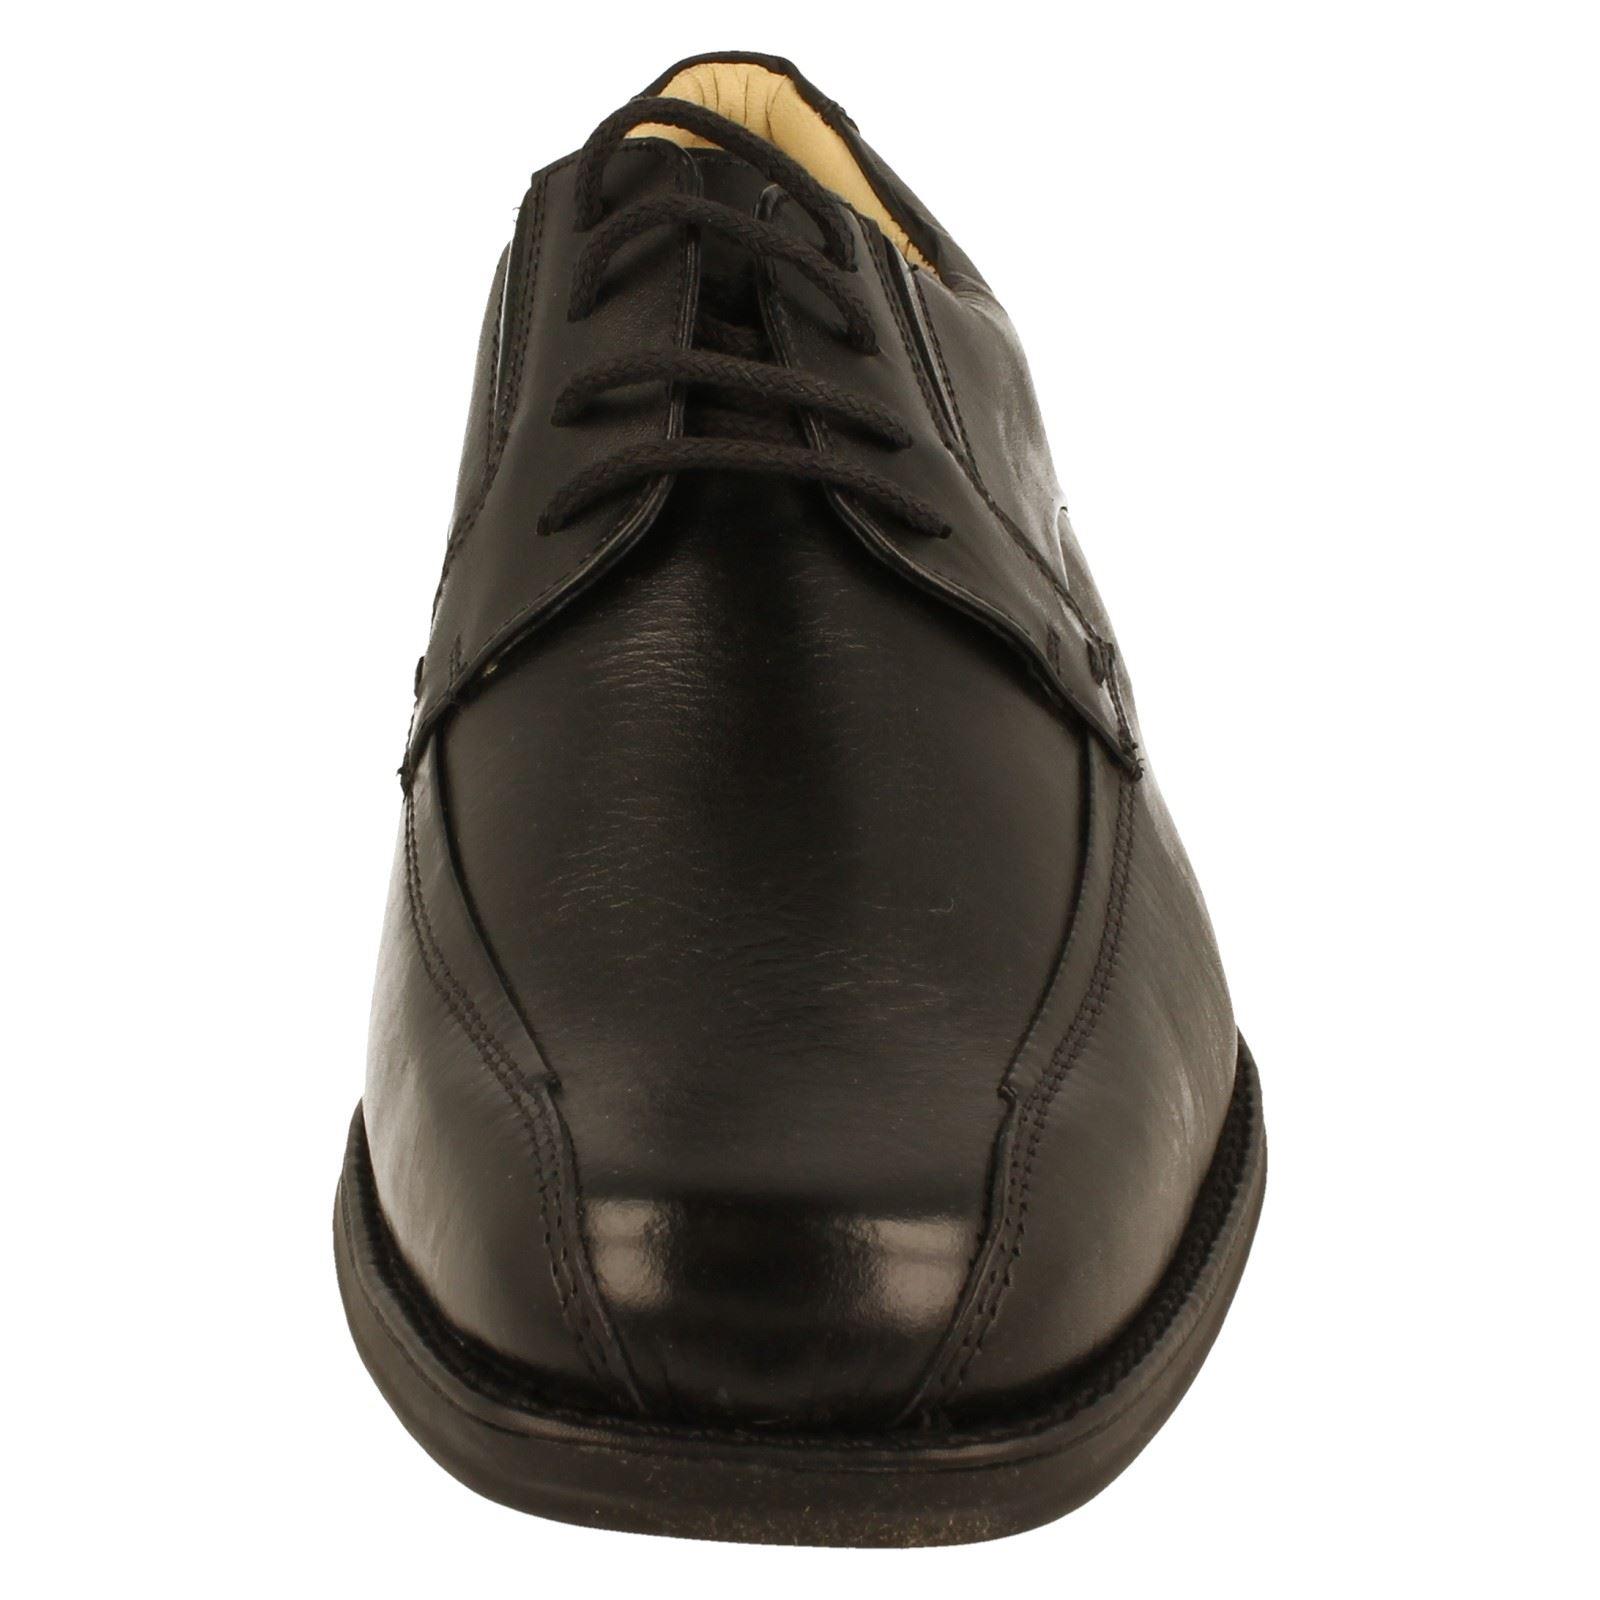 Herren Anatomic Lace Up Schuhes Label Bora -w -w Bora 11f360